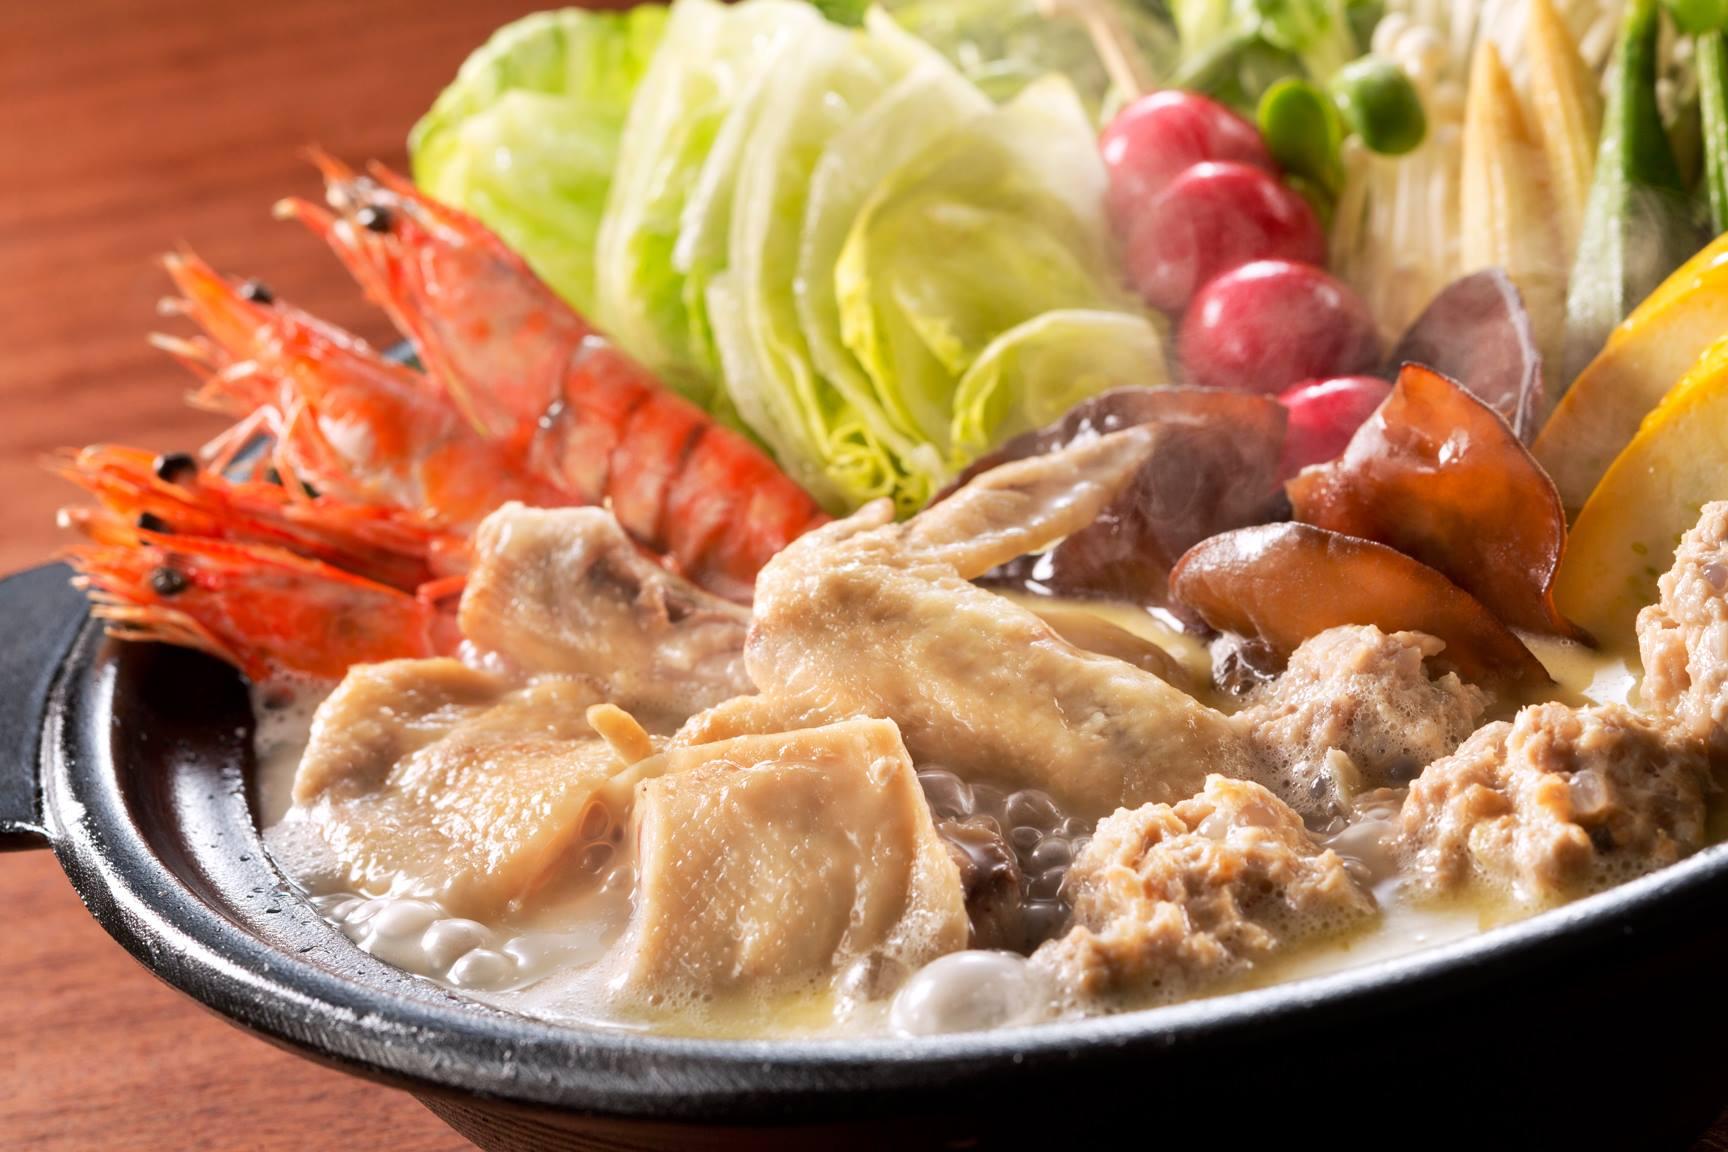 Tsukada Nojo | Steamboat restaurants in Singapore